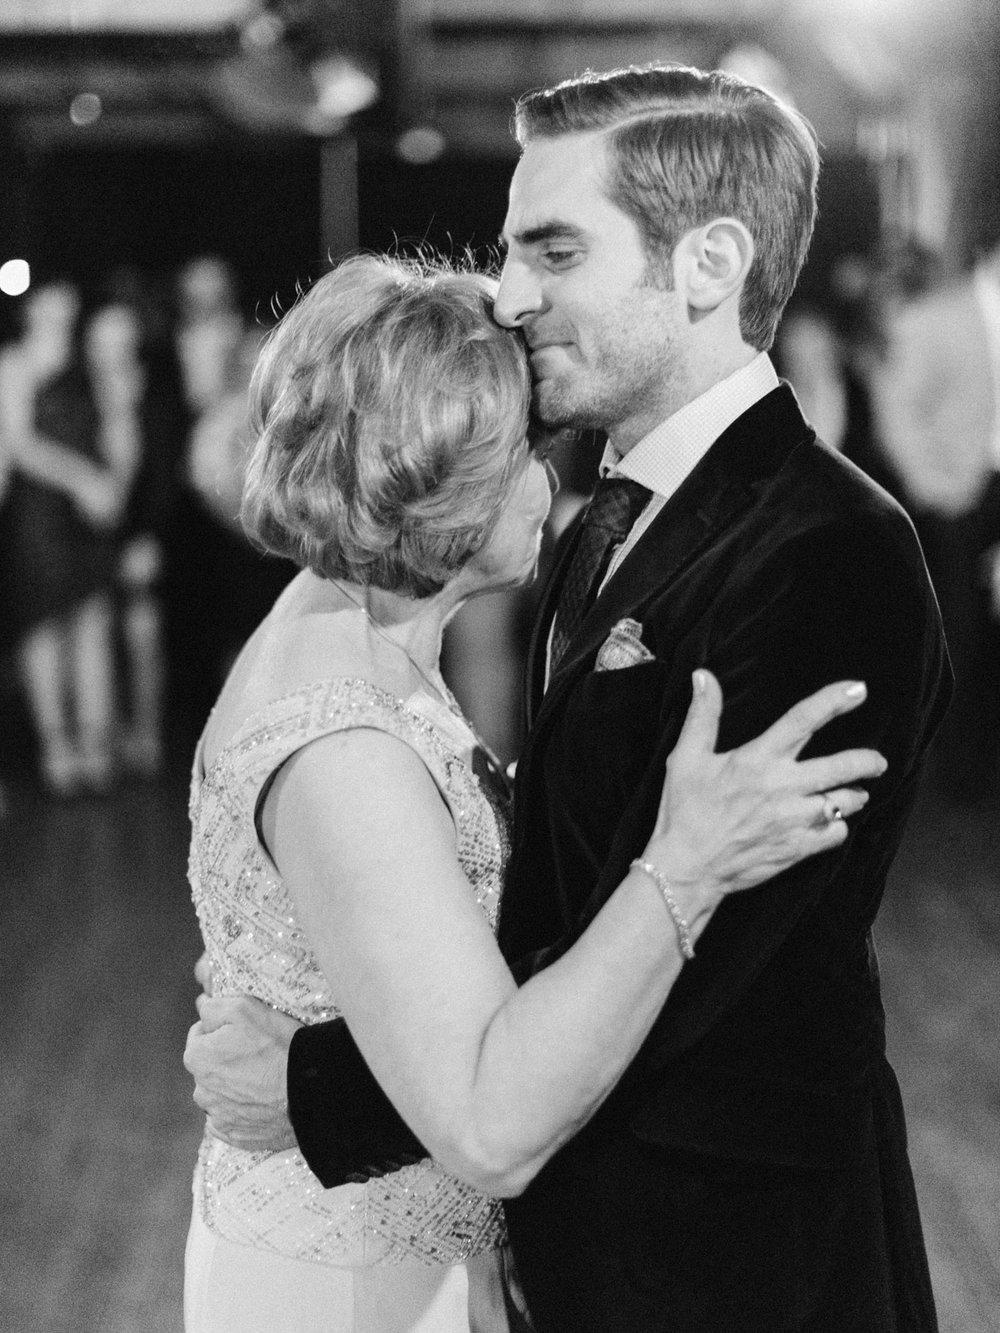 Toronto-wedding-photographer-intimate-italian-the-burroughes-downtown165.jpg